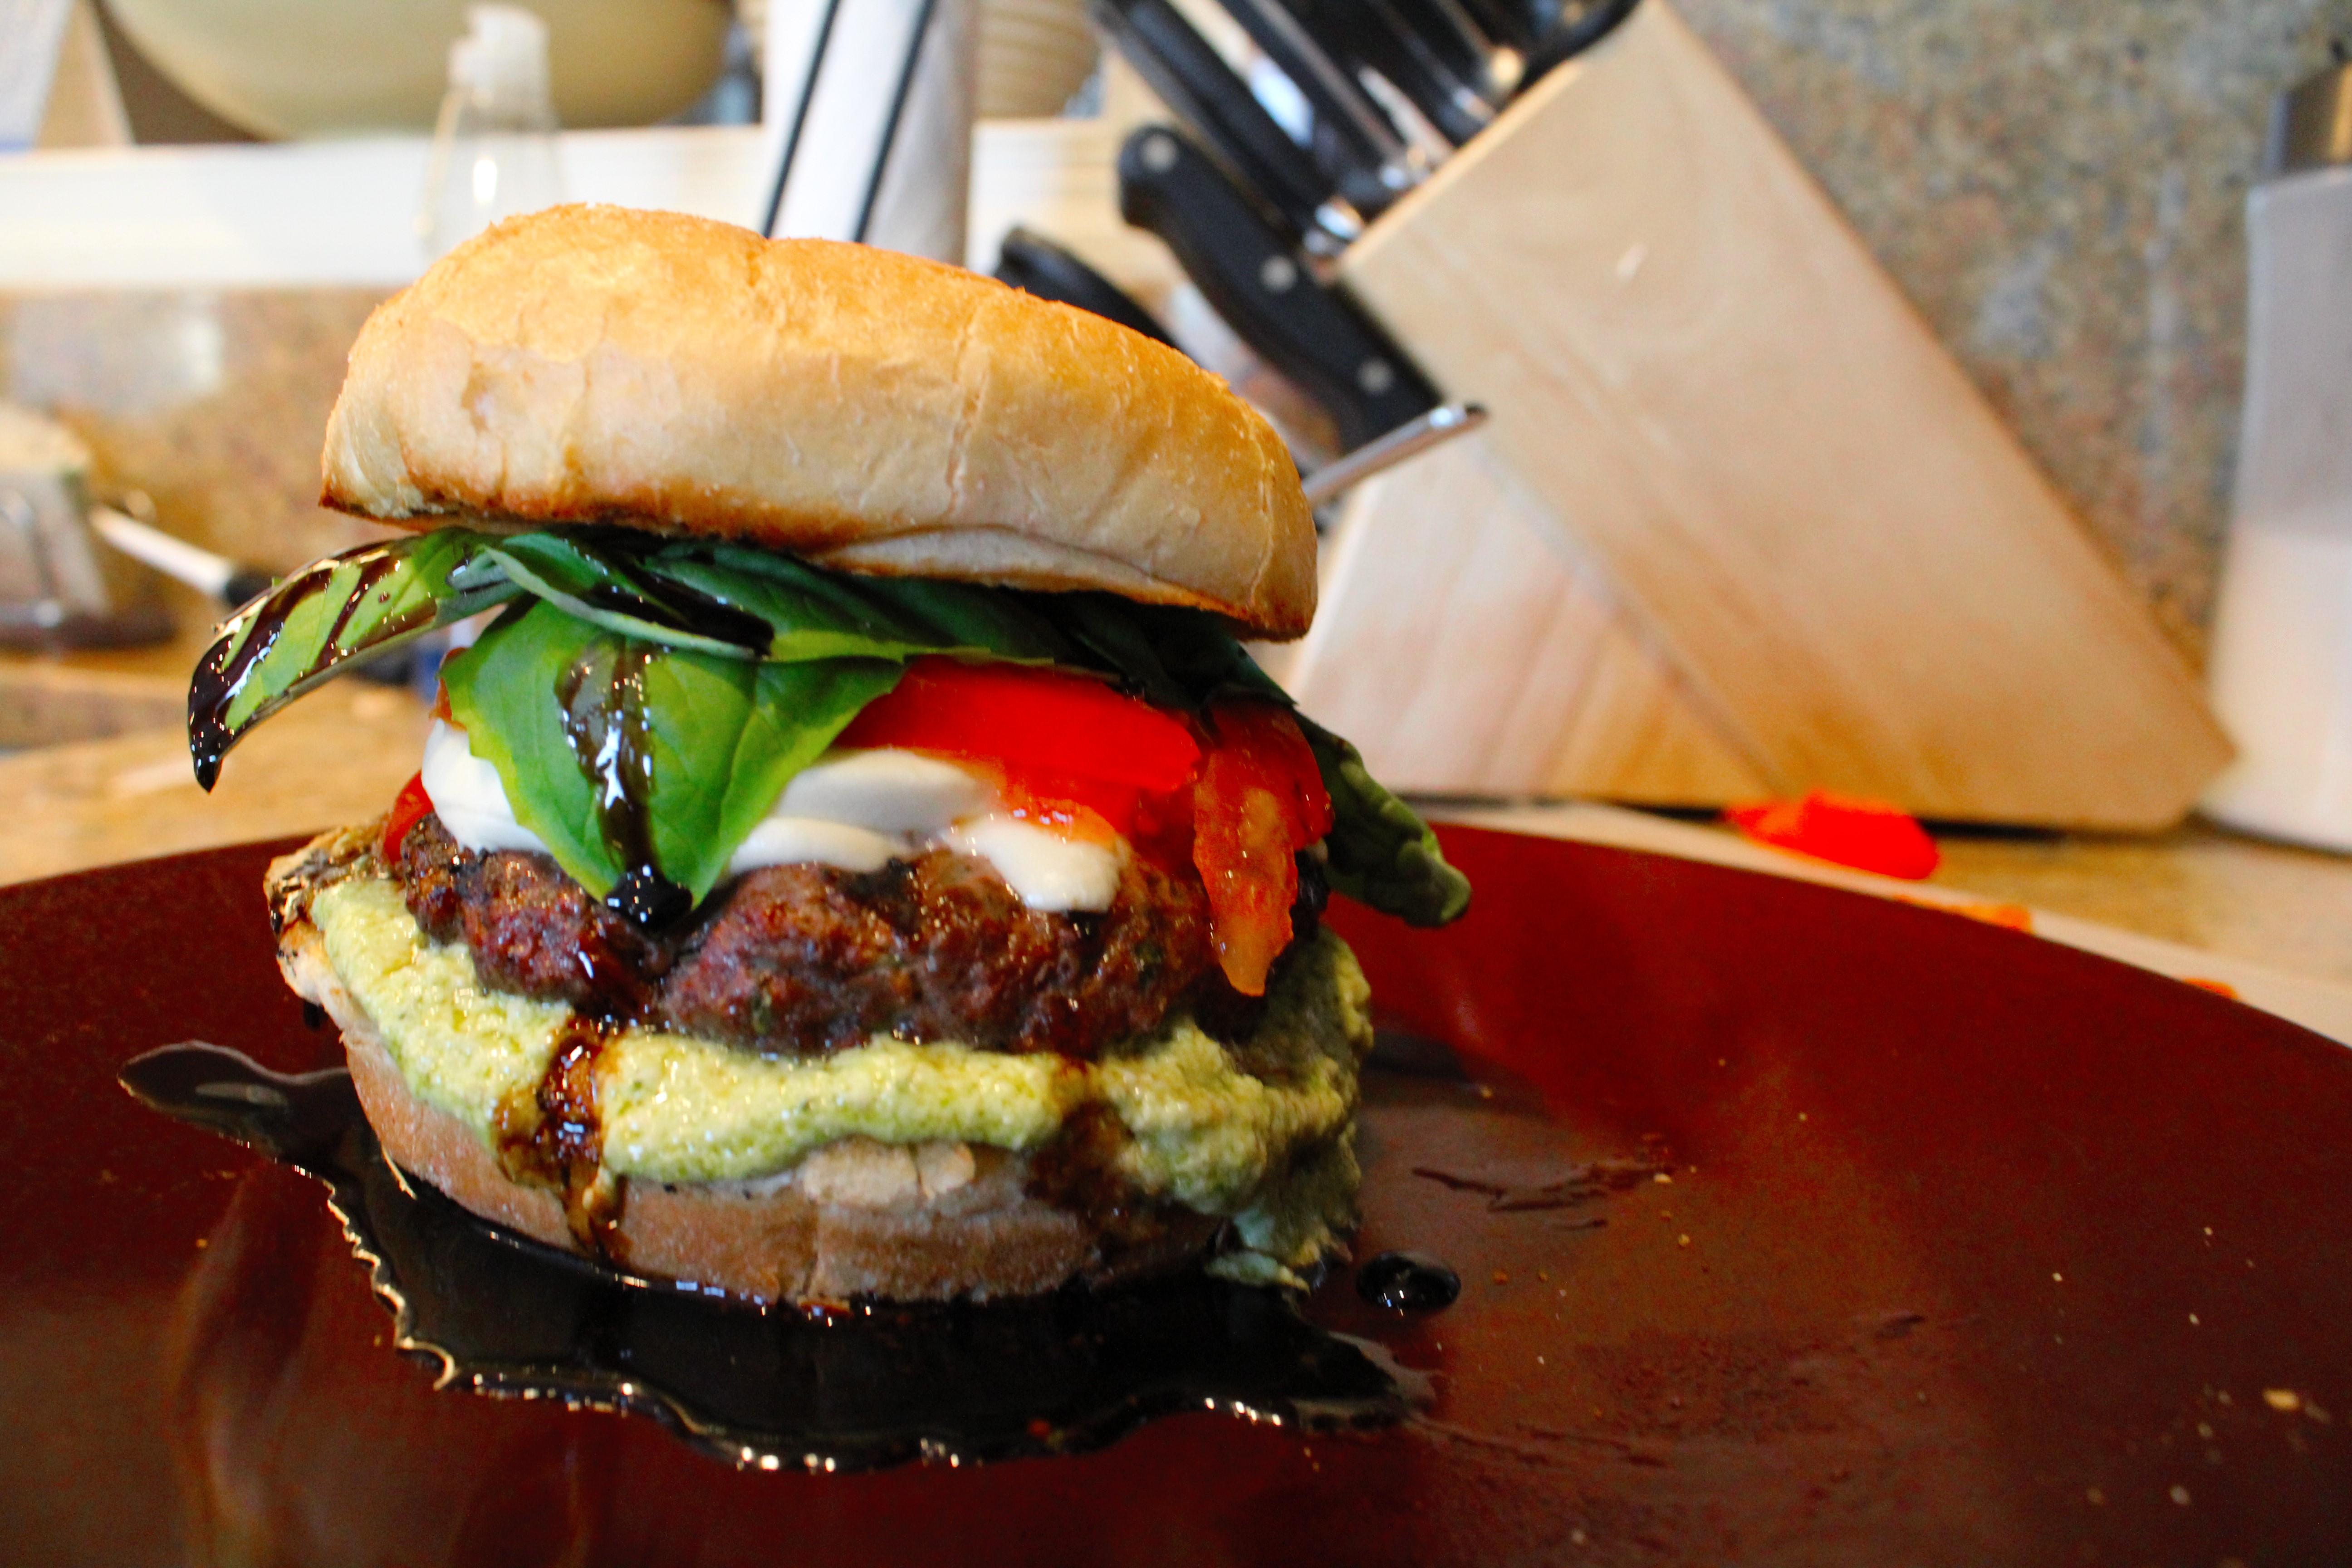 Caprese Burgers with Balsamic Glaze and Artichoke Pesto Spread